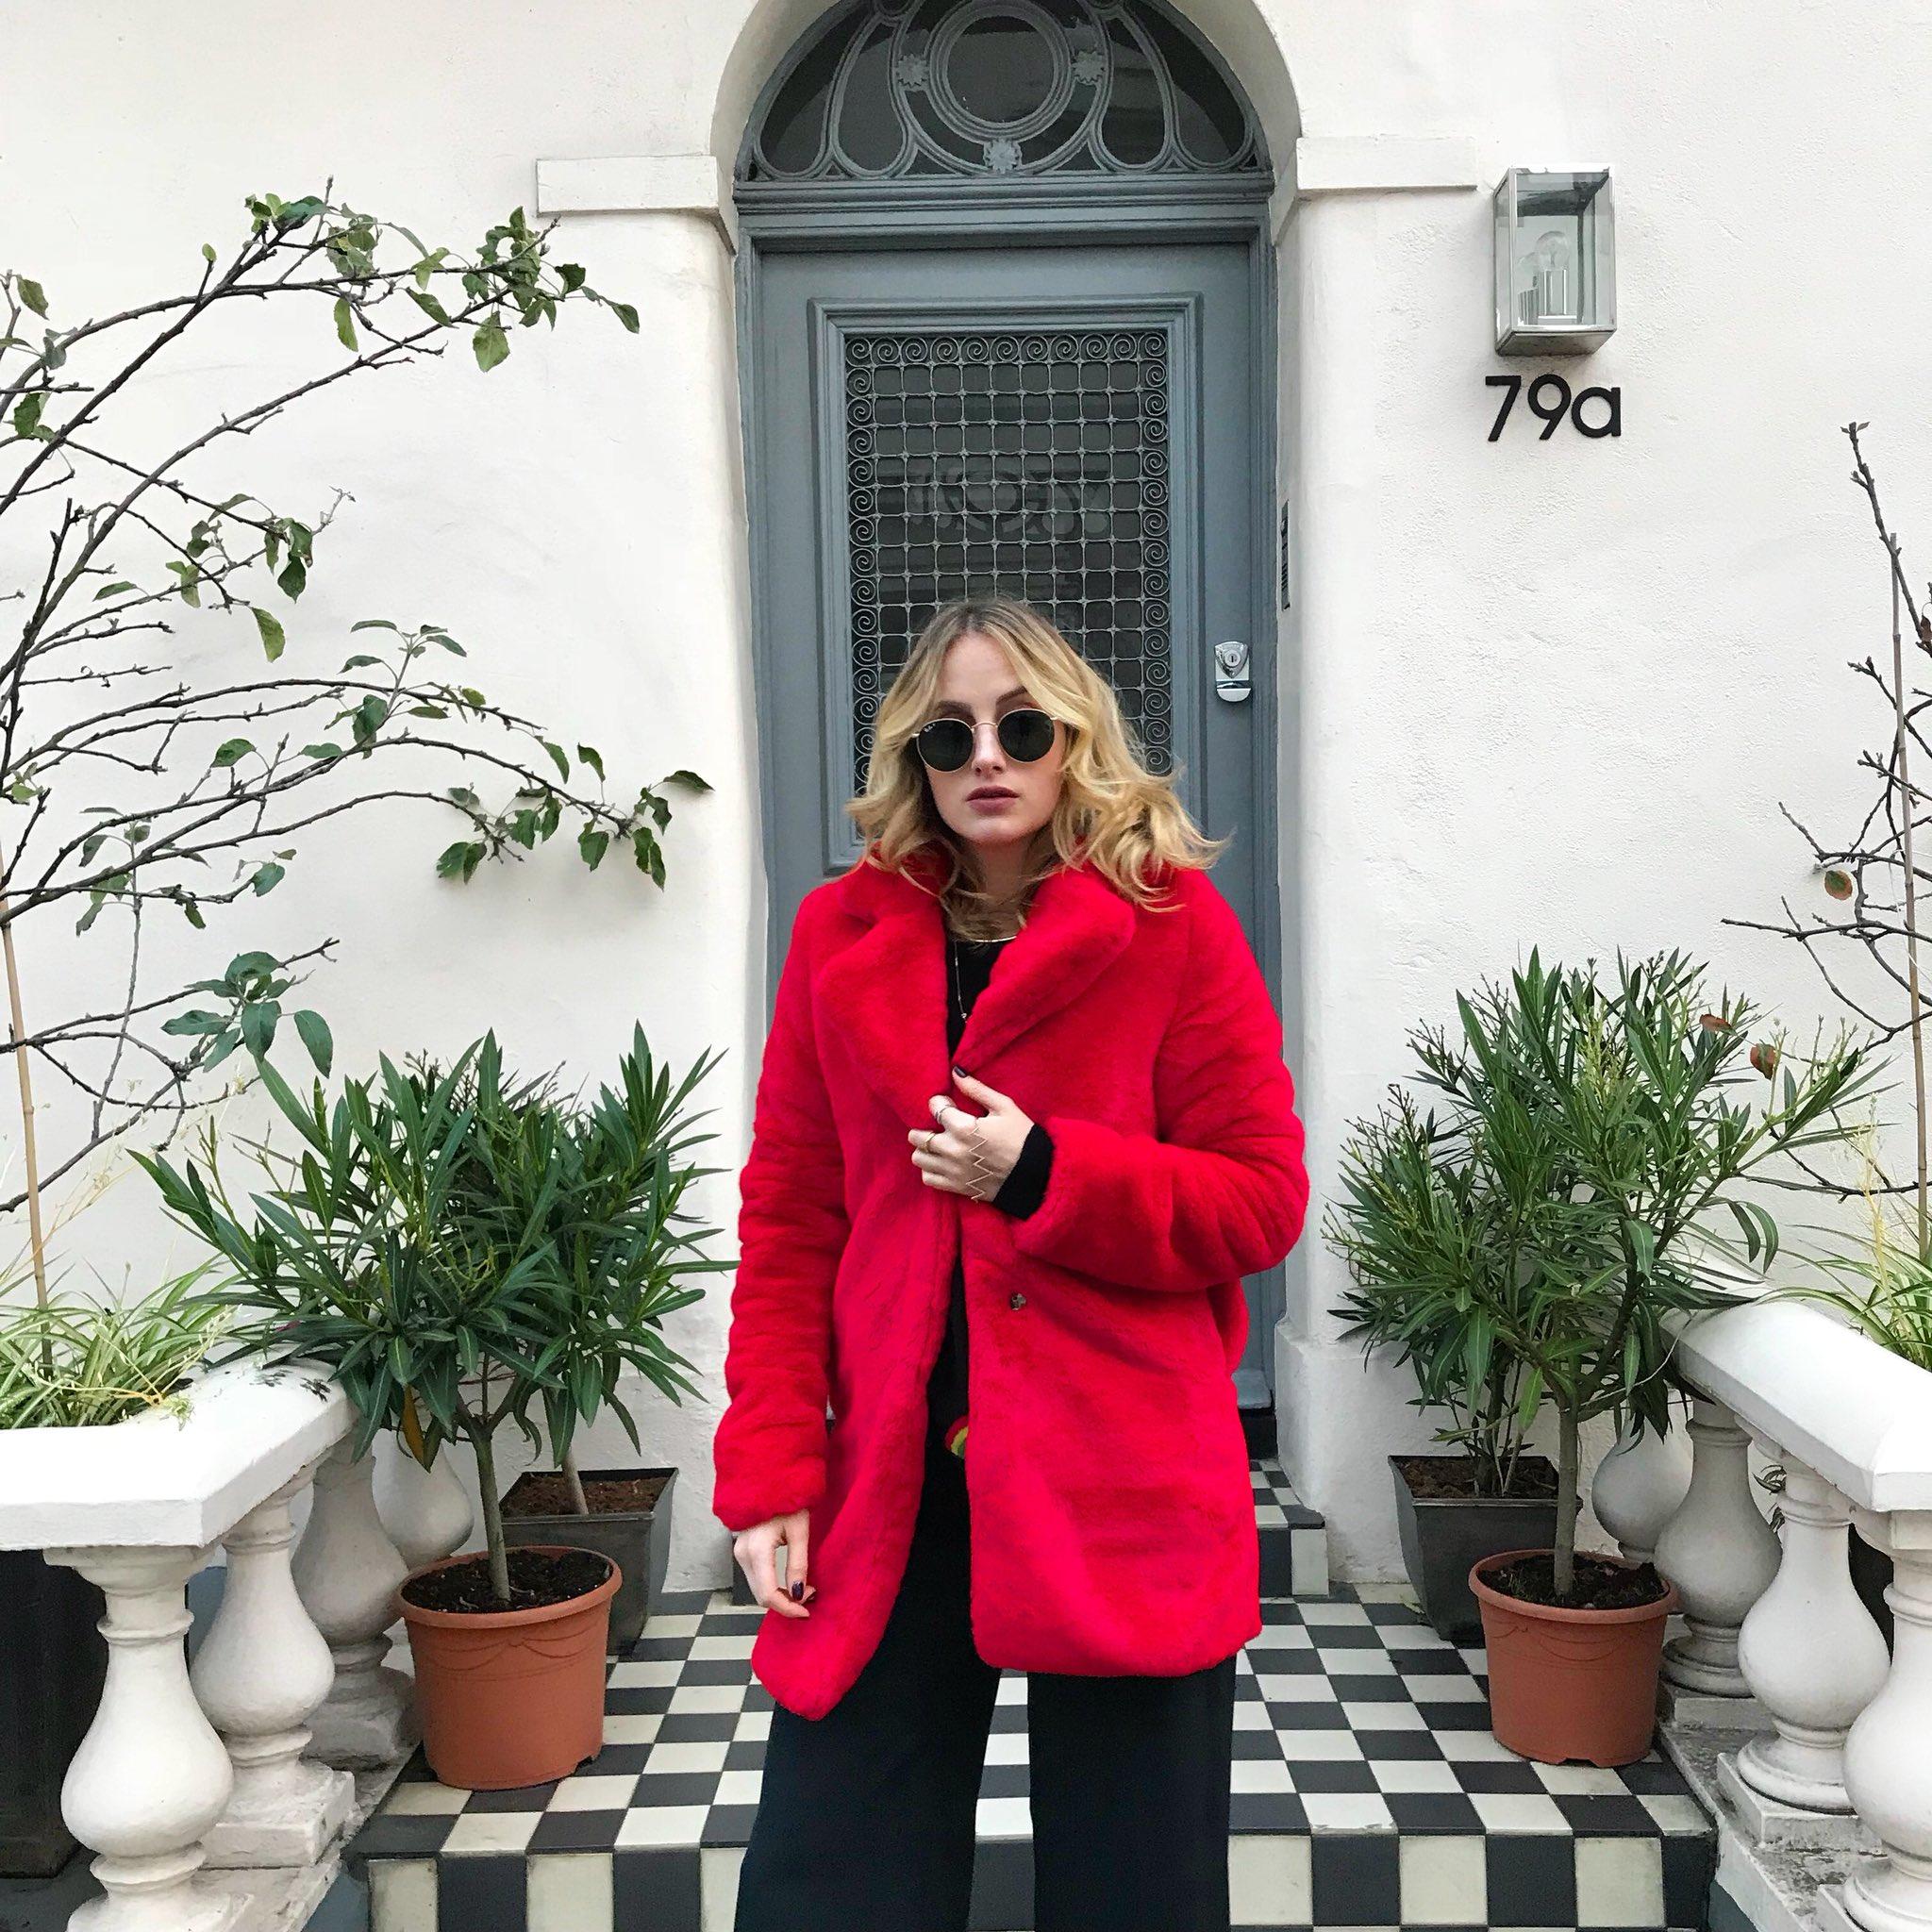 ❤️ red coat dreams 💭 https://t.co/OlKpUmLUvG @MissyEmpireUK https://t.co/eWxF3PDqOD